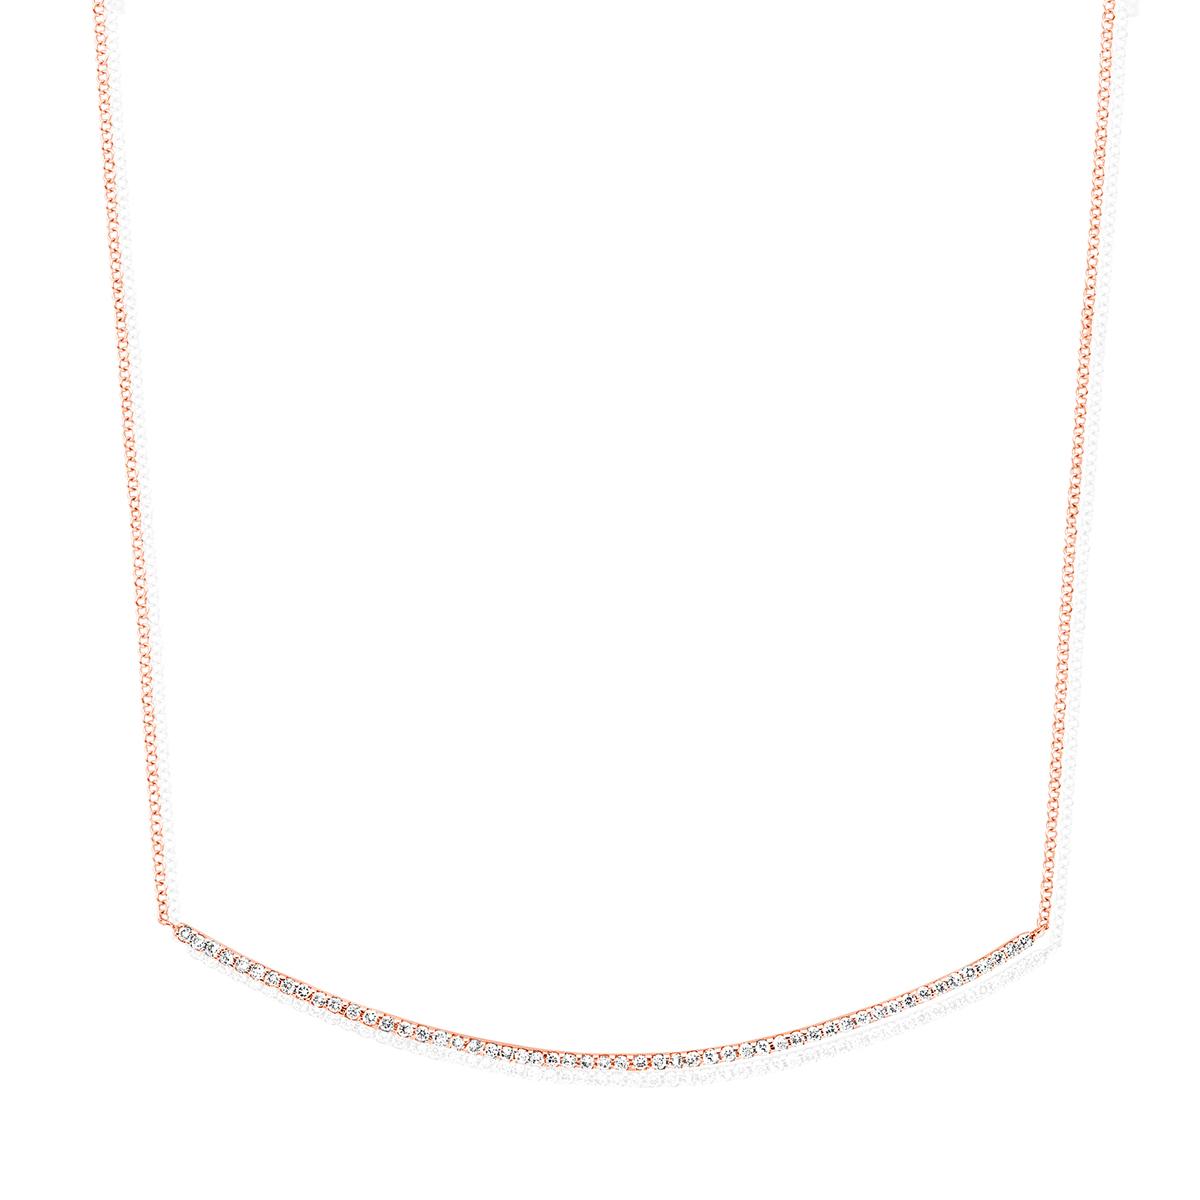 ischia basics necklace in rose gold